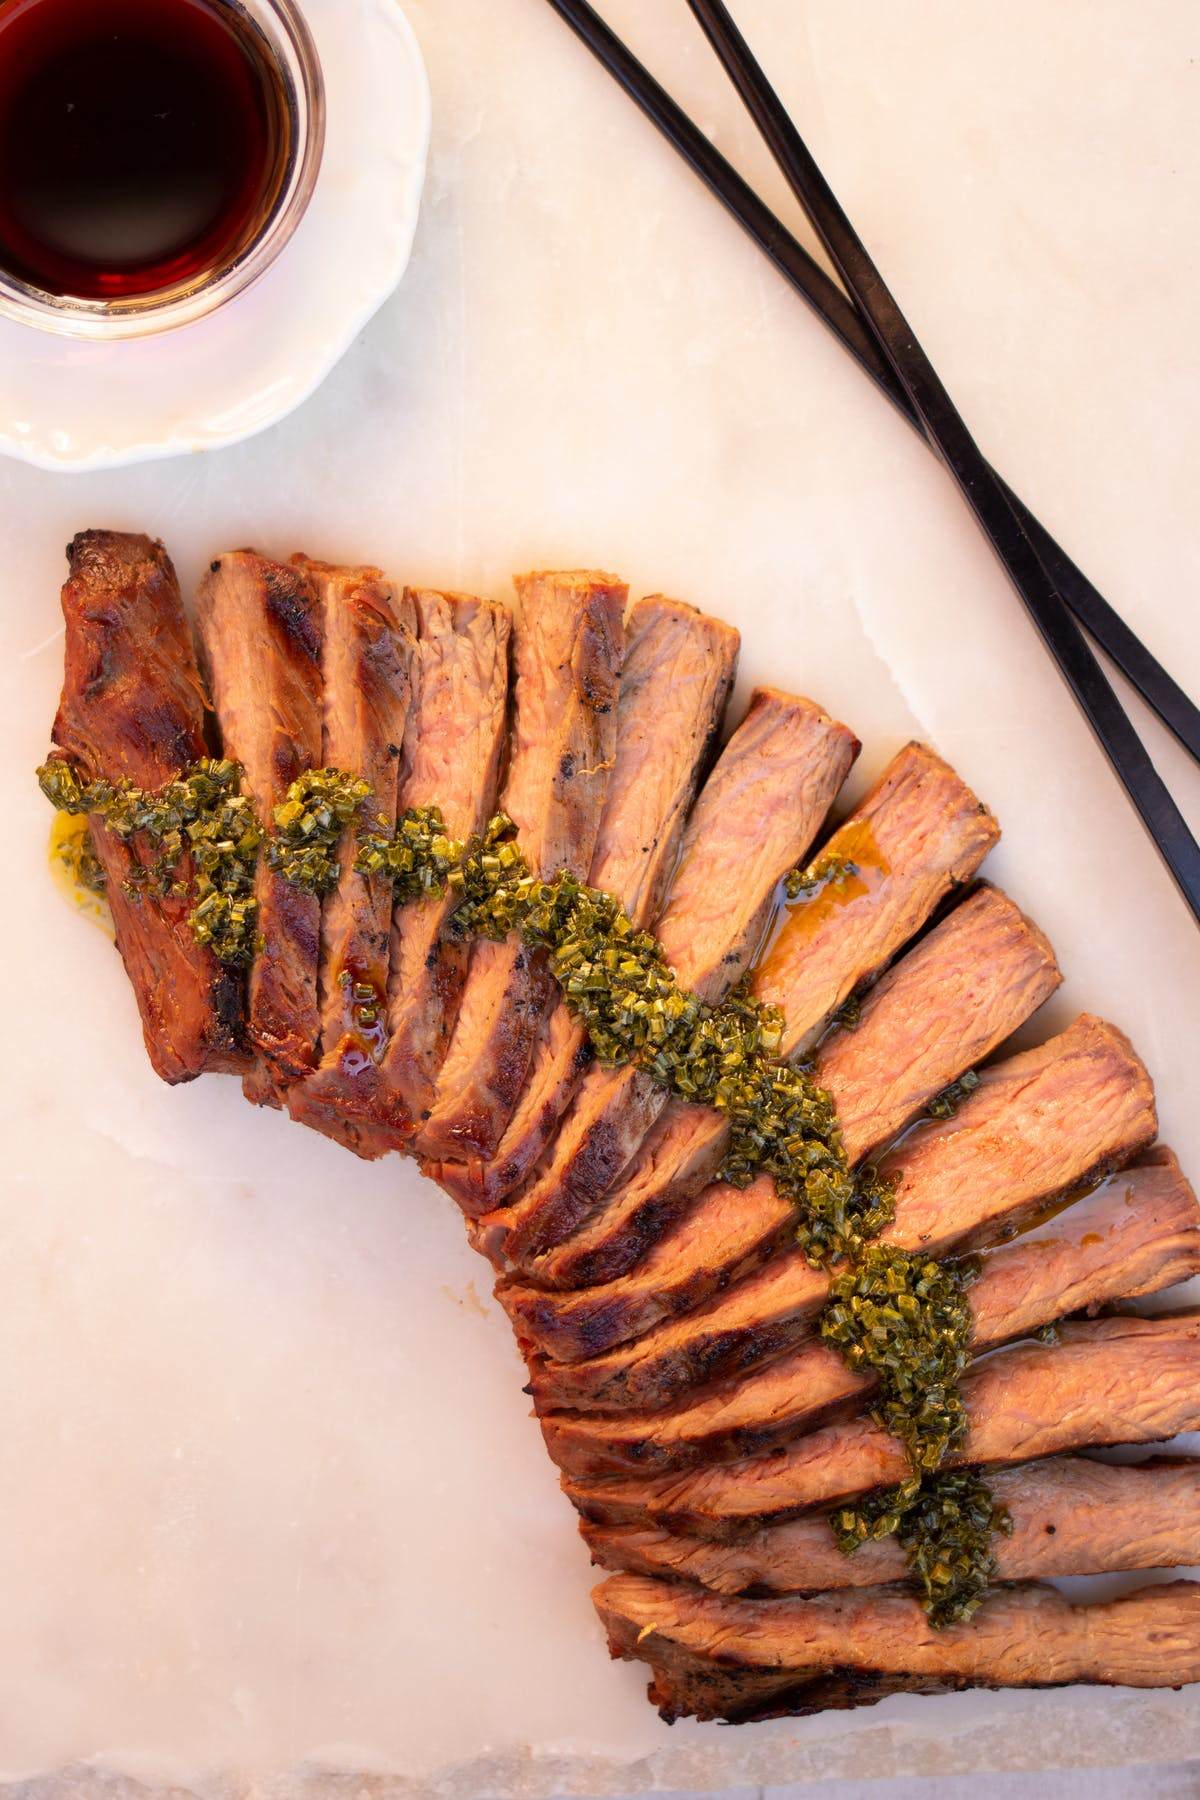 Teriyaki grilled steak